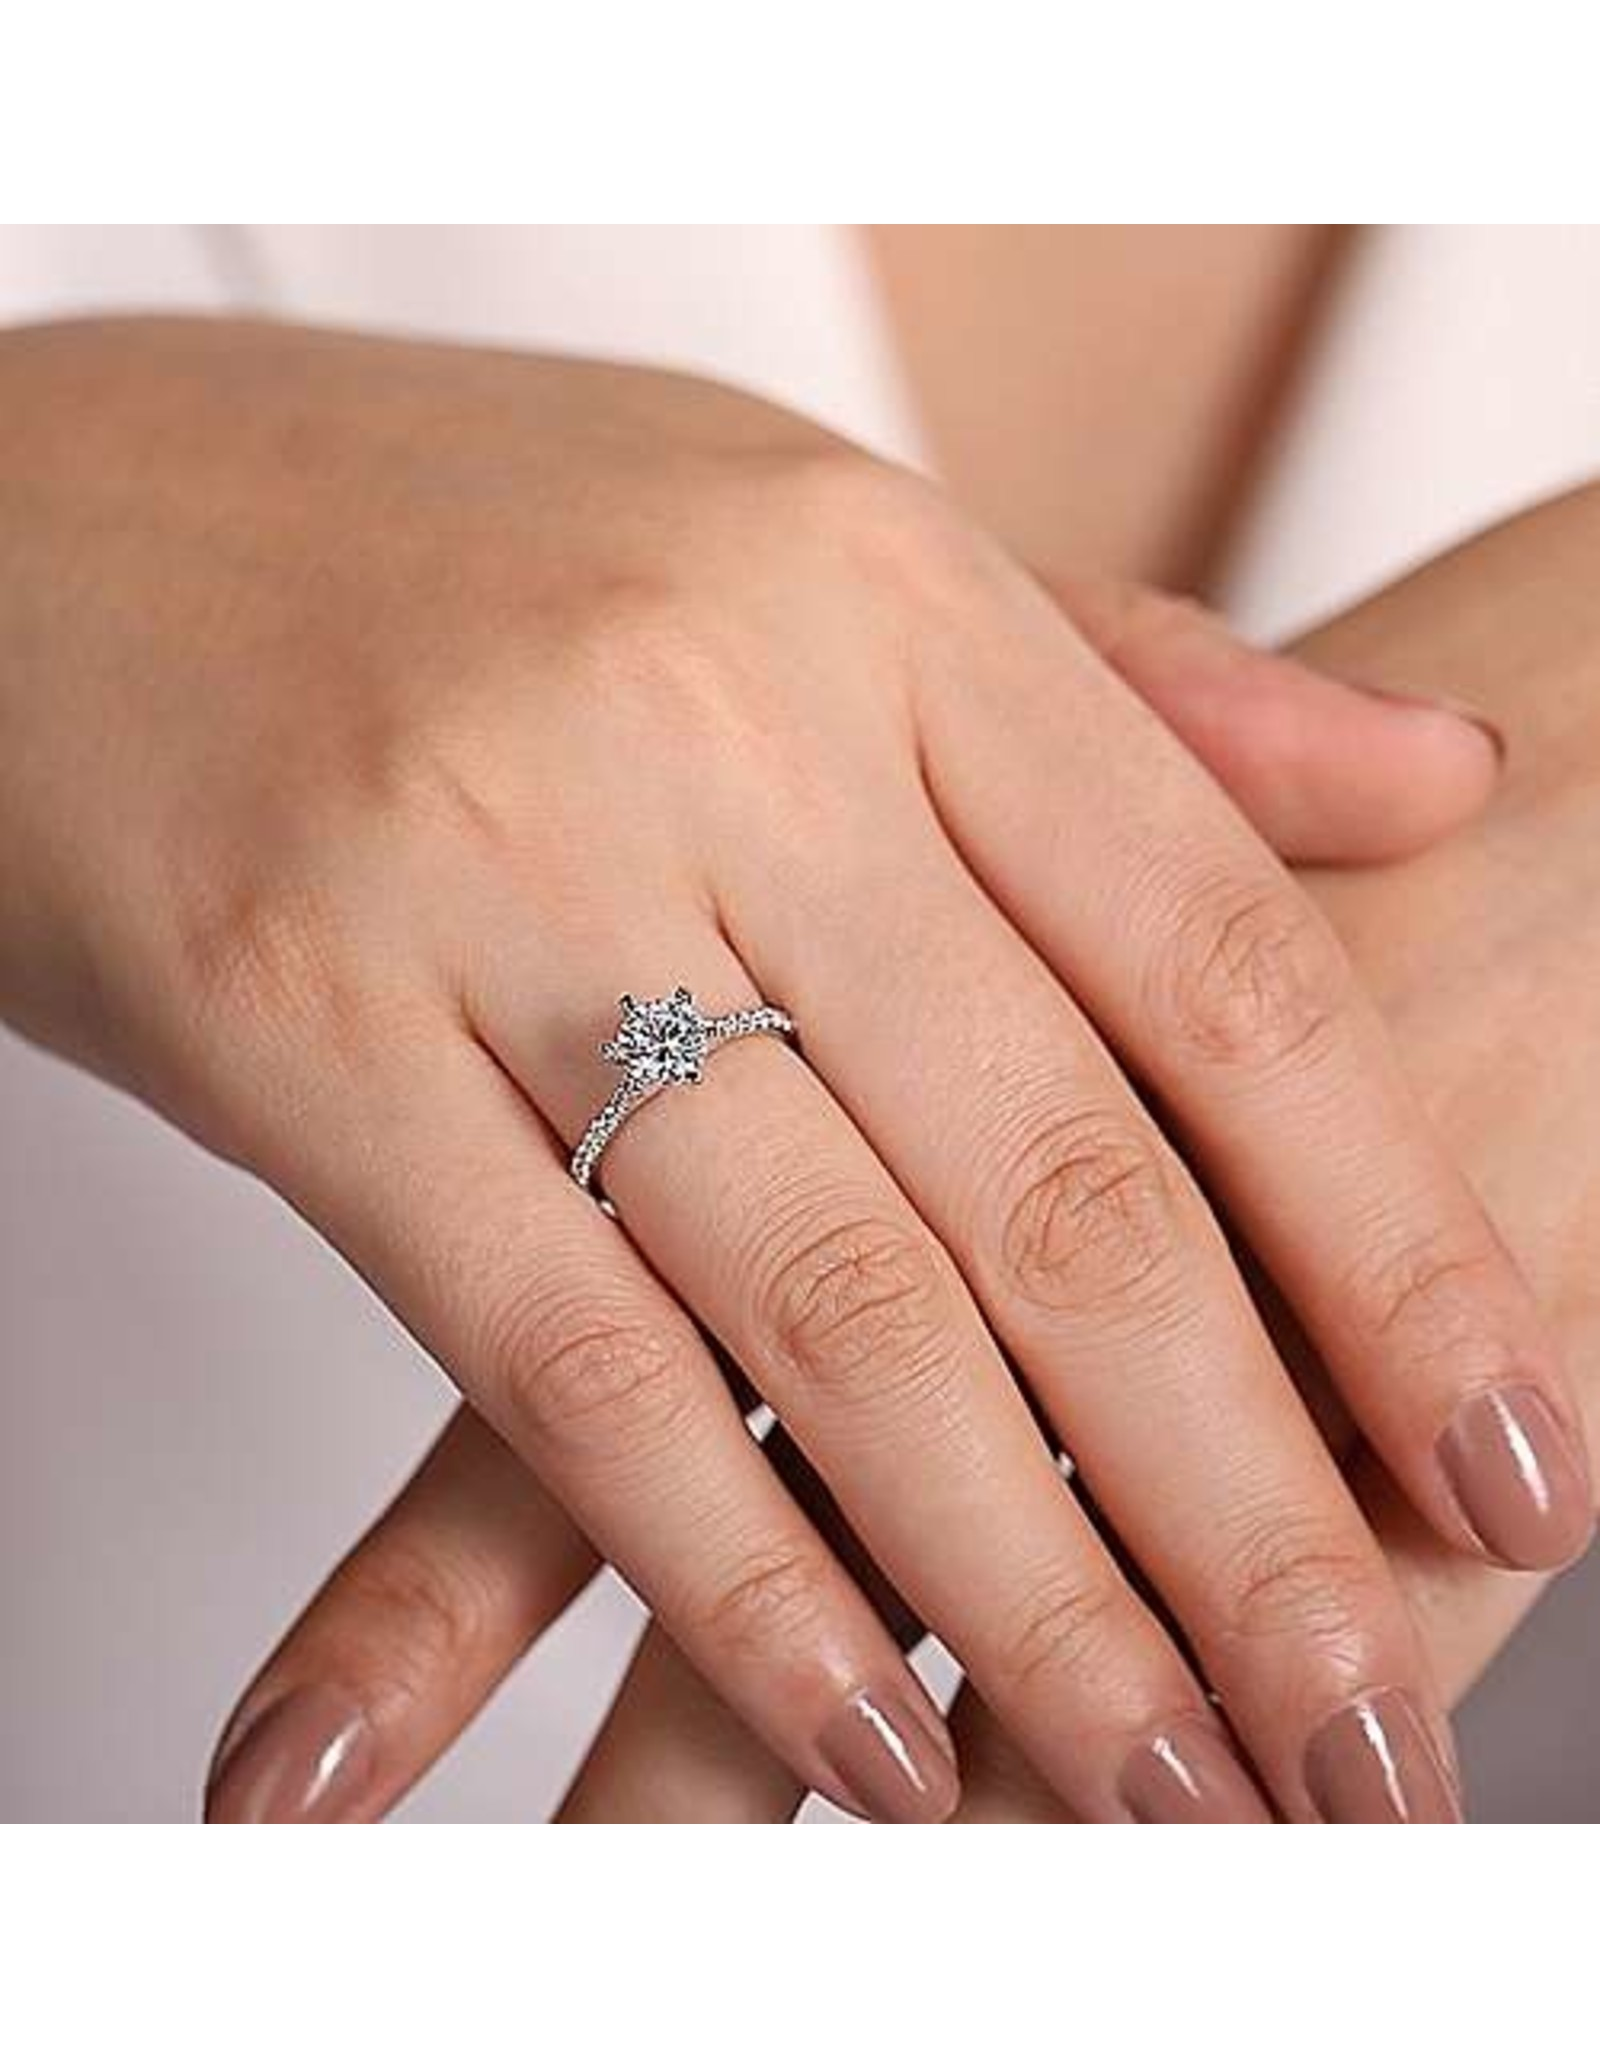 14K White Gold Round Brilliant Diamond Engagement Ring, D: 1.02ct, H, SI2